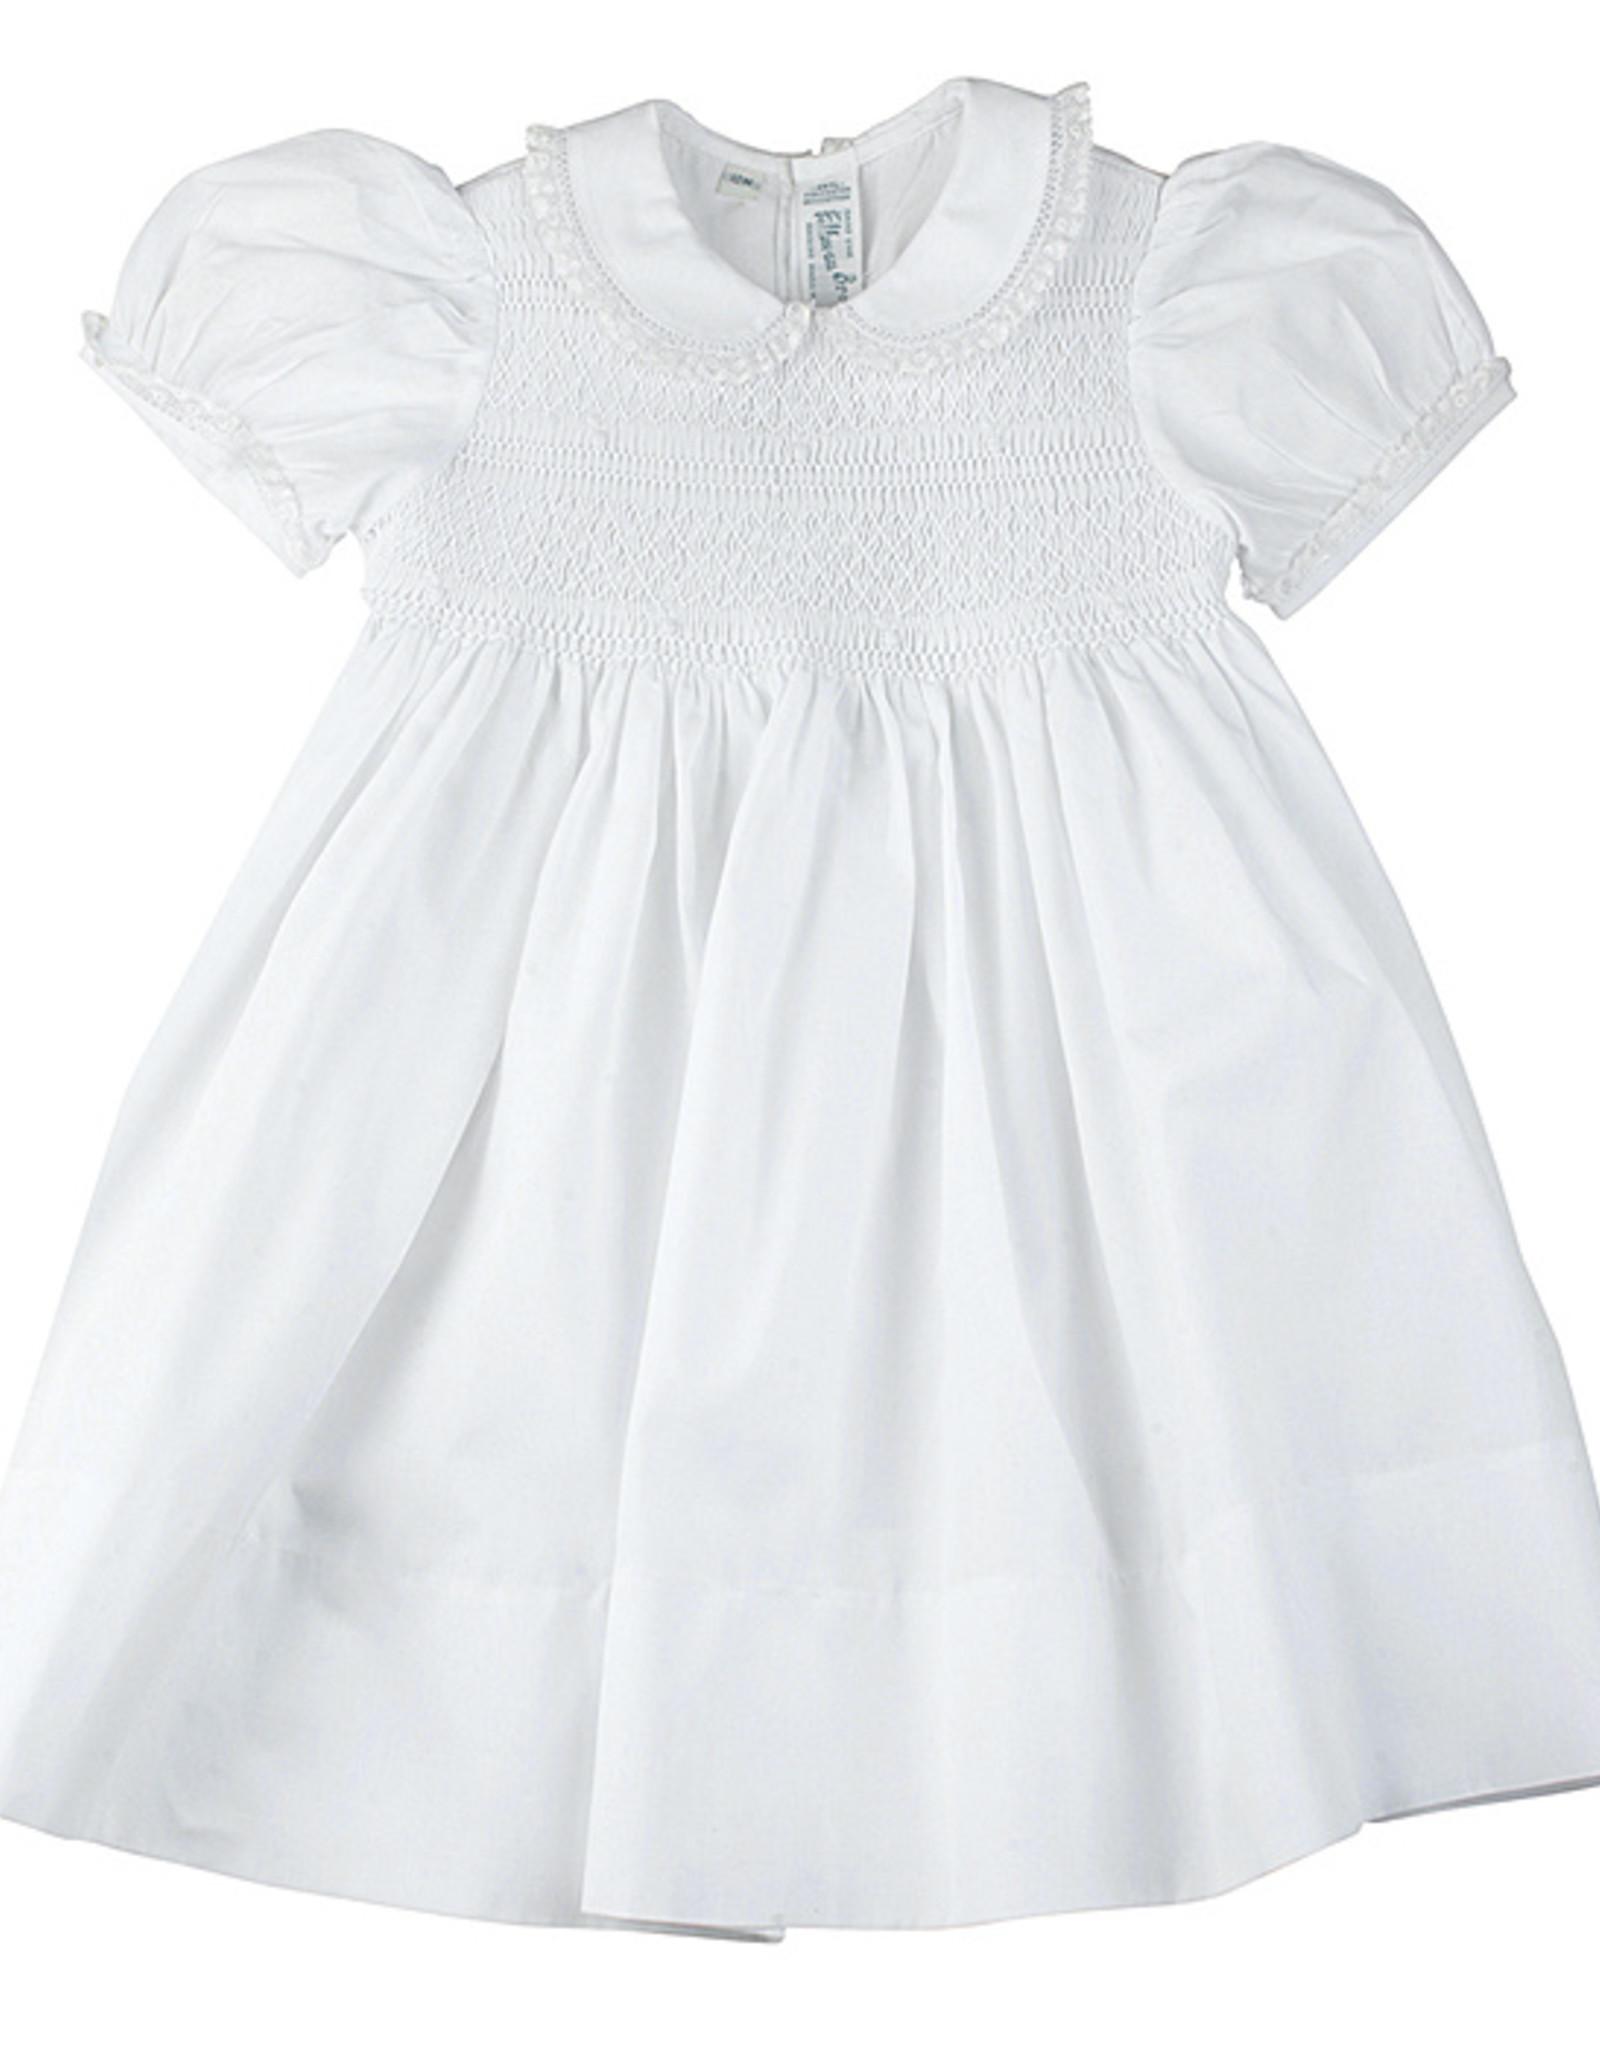 Feltman Brothers Girls Lacy Smocked Dress